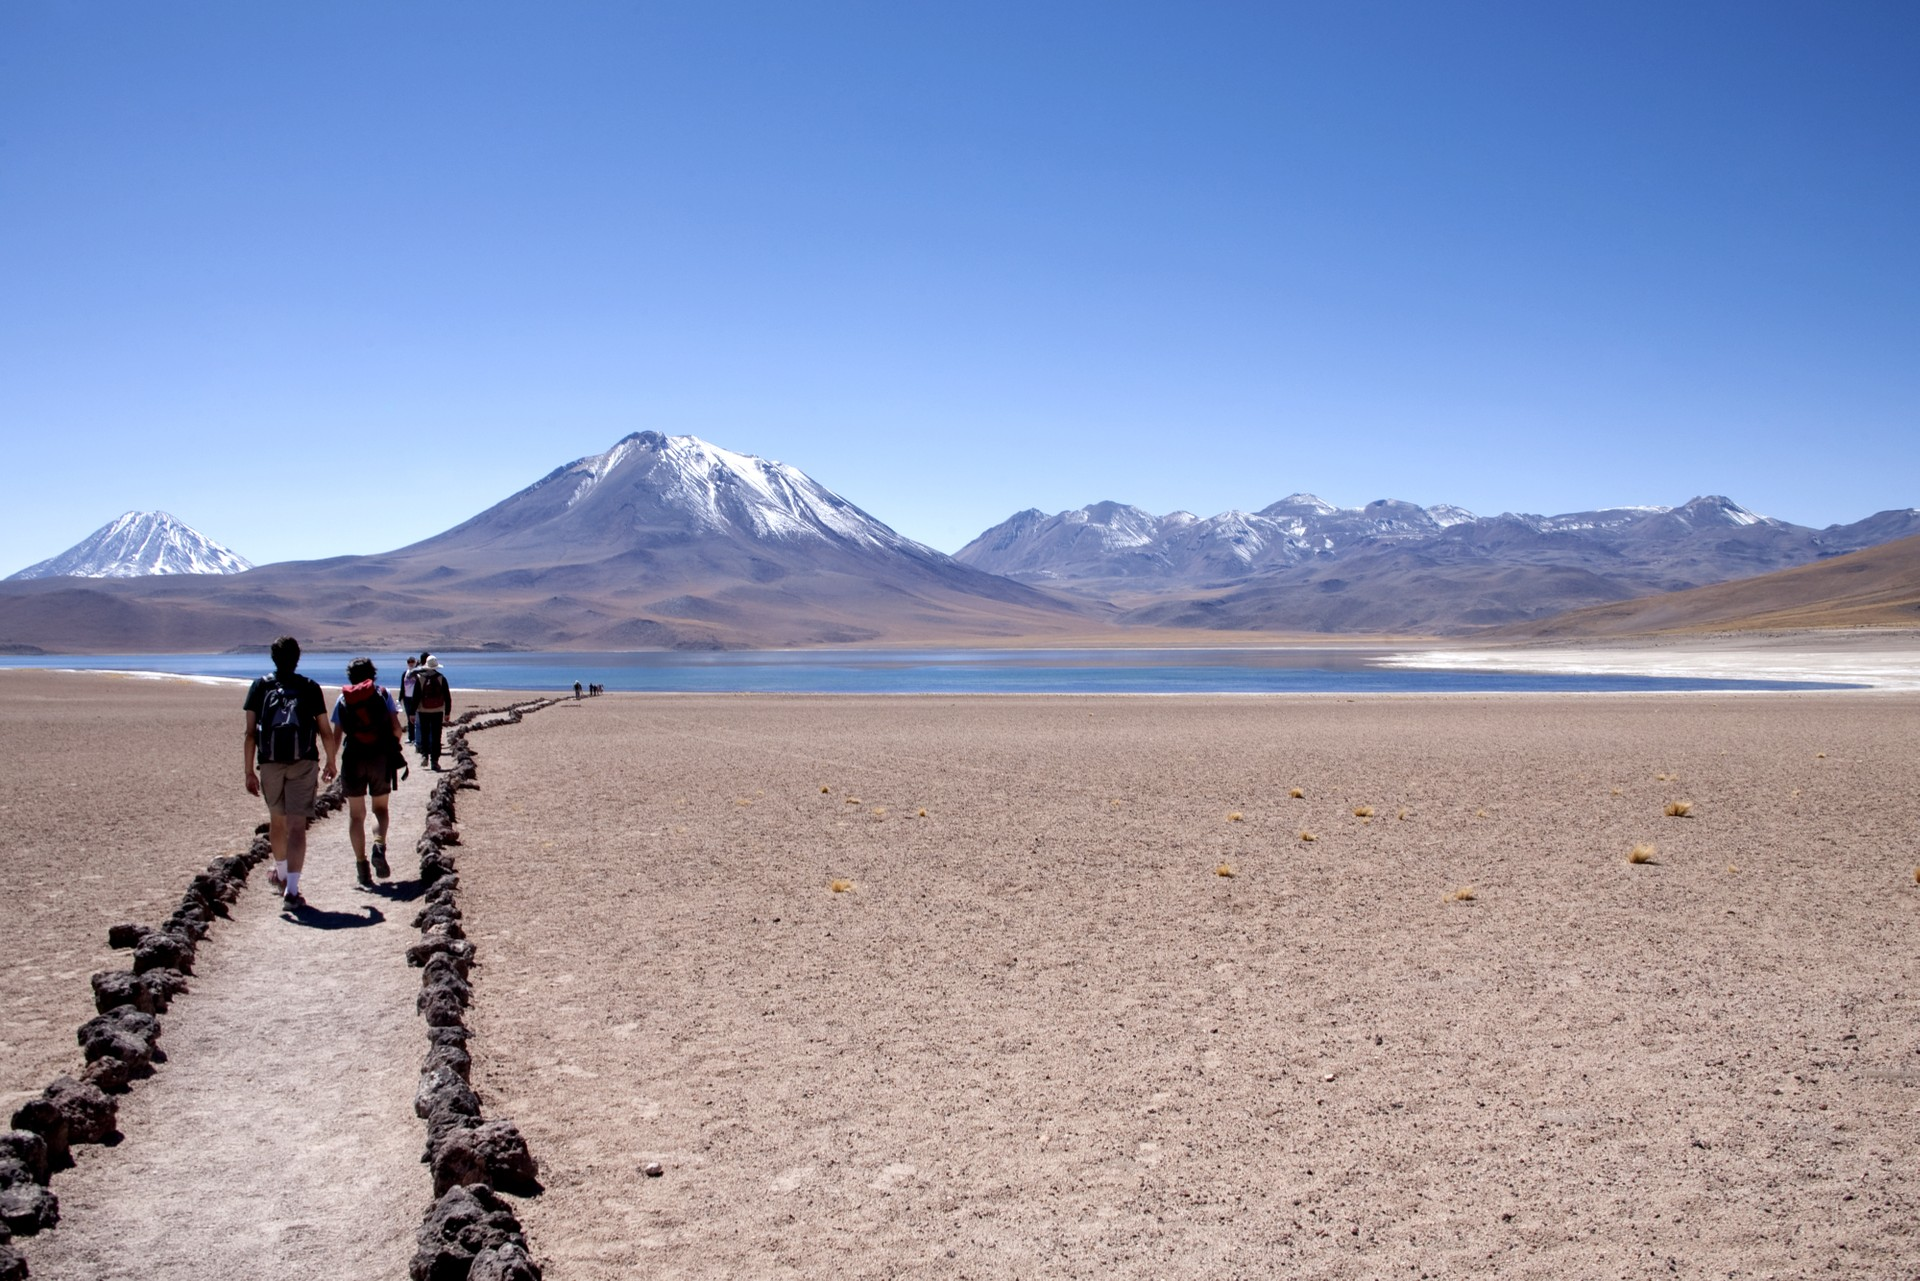 Hikers in the Atacama Desert in Chile